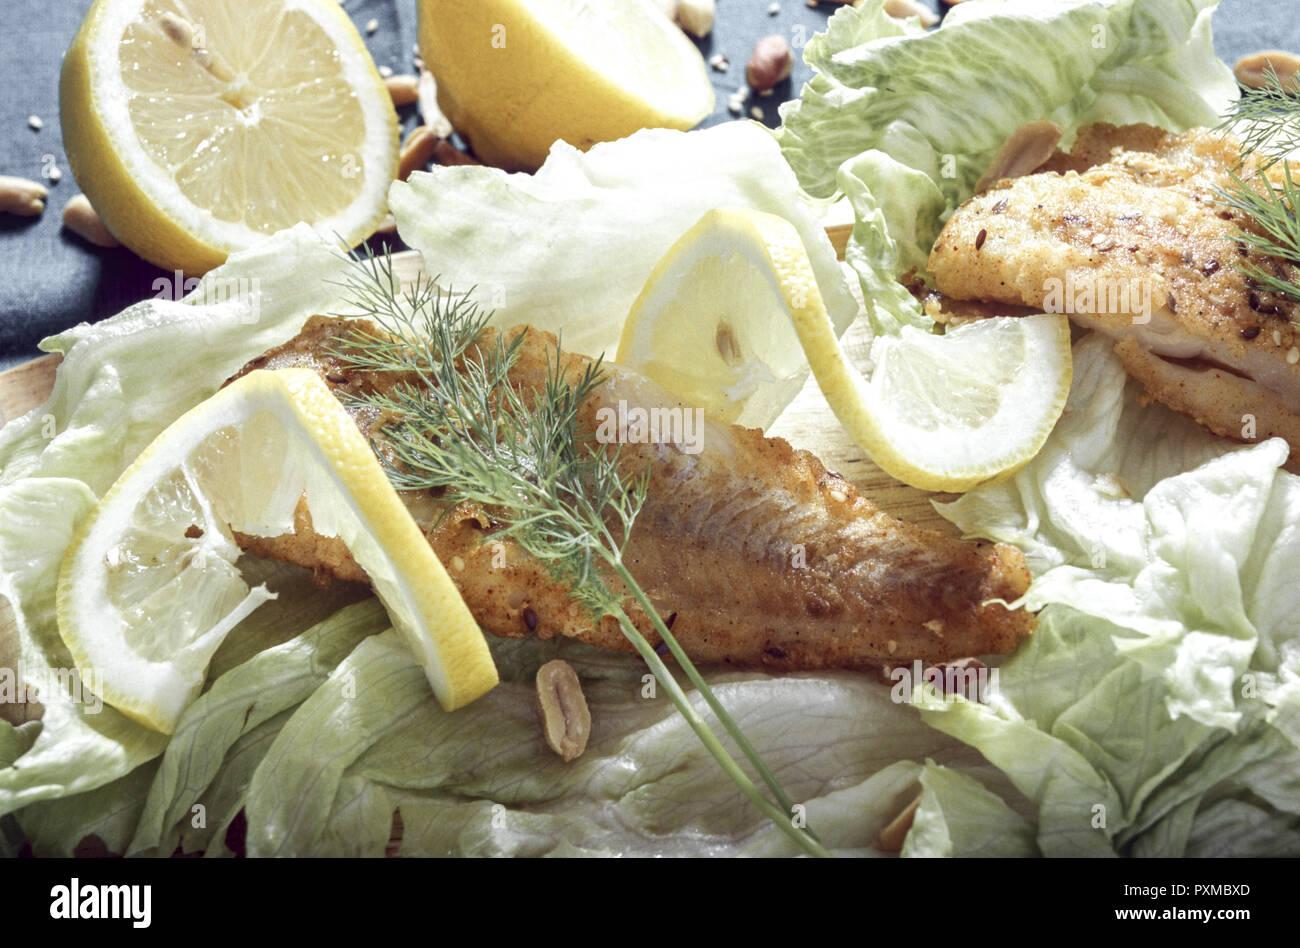 Fisch Fischgericht Essen Fischfilet Gebraten Goldbarsch Lebensmittel Nahrungsmittel Mahlzeit Feinkost Delikatesse Spezialitaet Salat Beilage Filet Kal - Stock Image